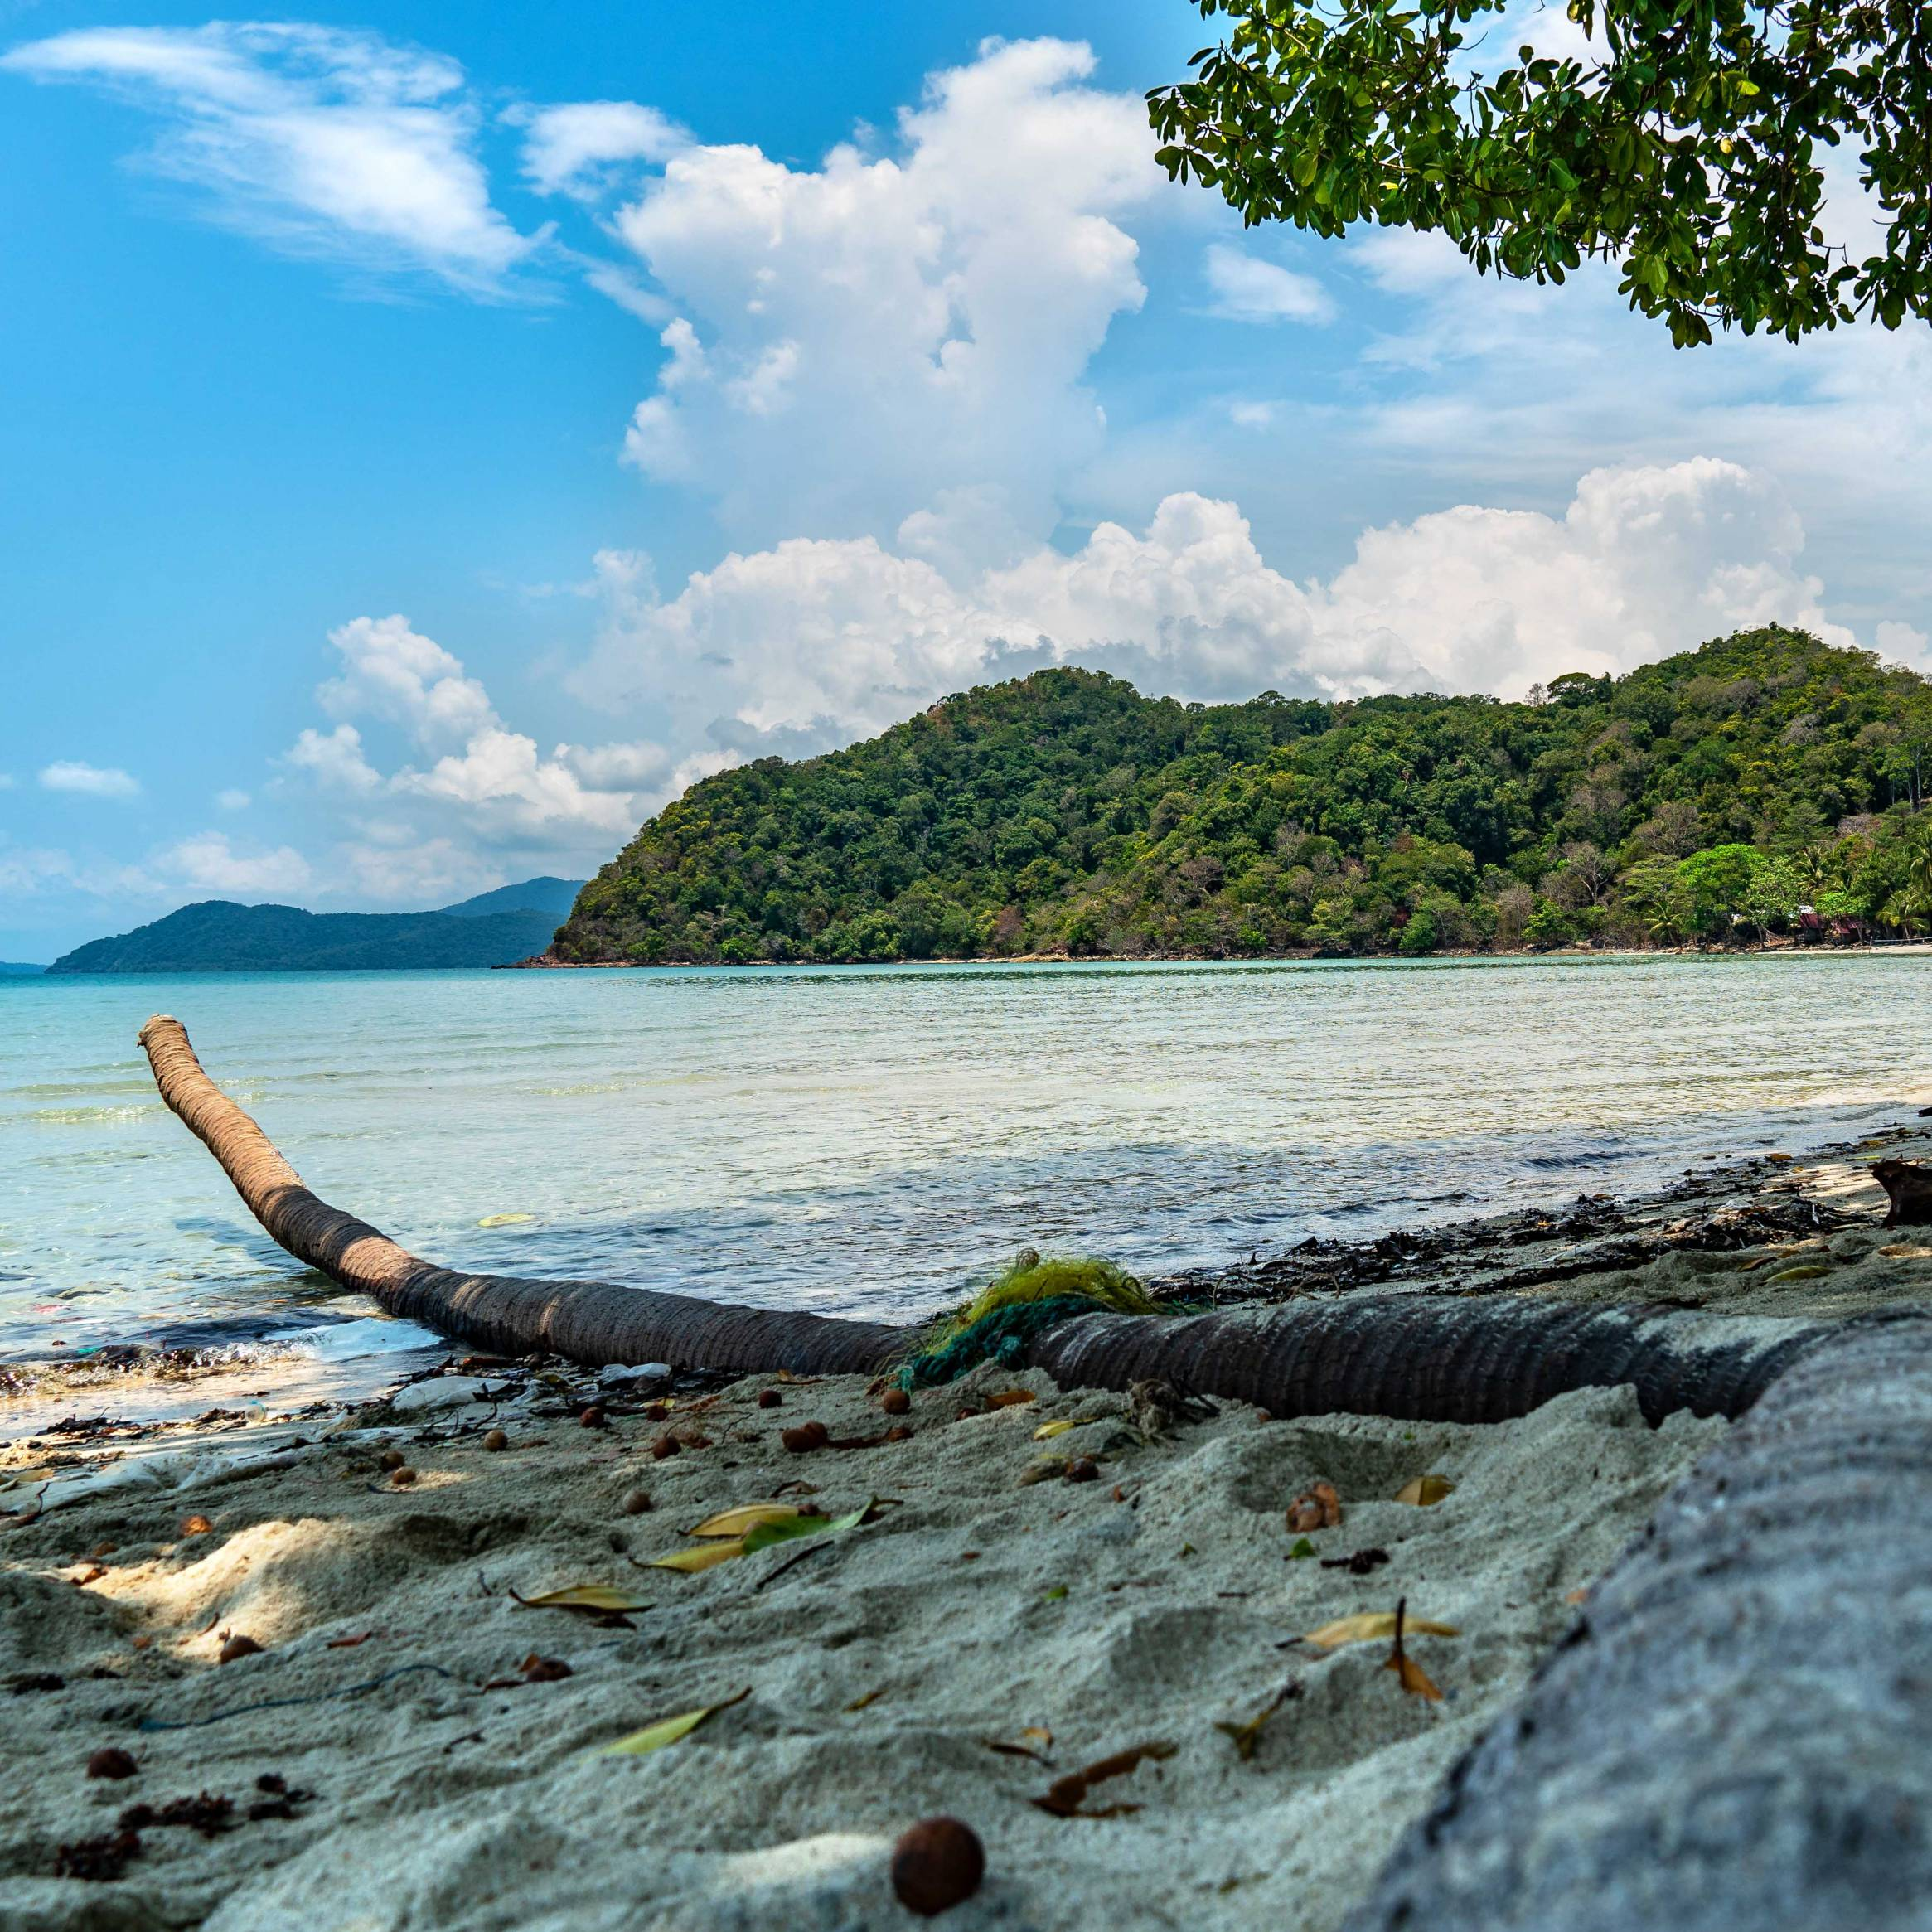 LONG BEACH, KOH CHANG ISLAND